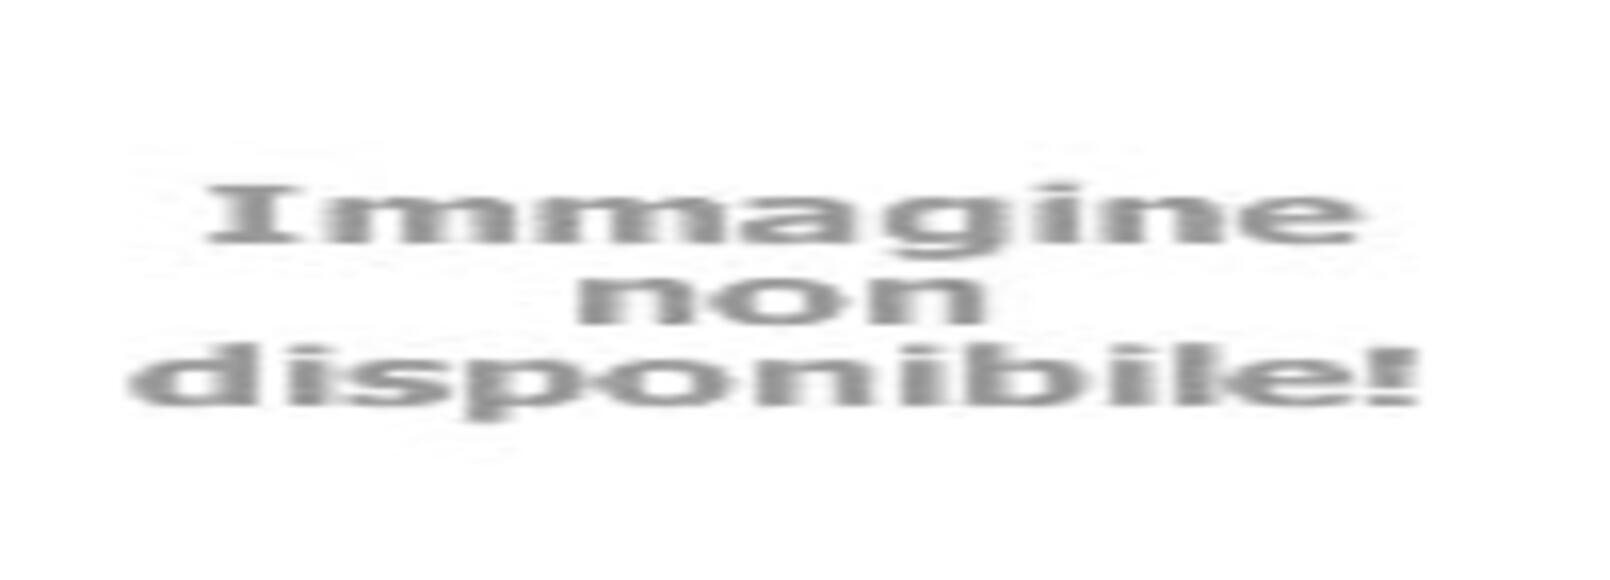 jhotel it colazione-a-torino-vicino-a-tangenziale 001